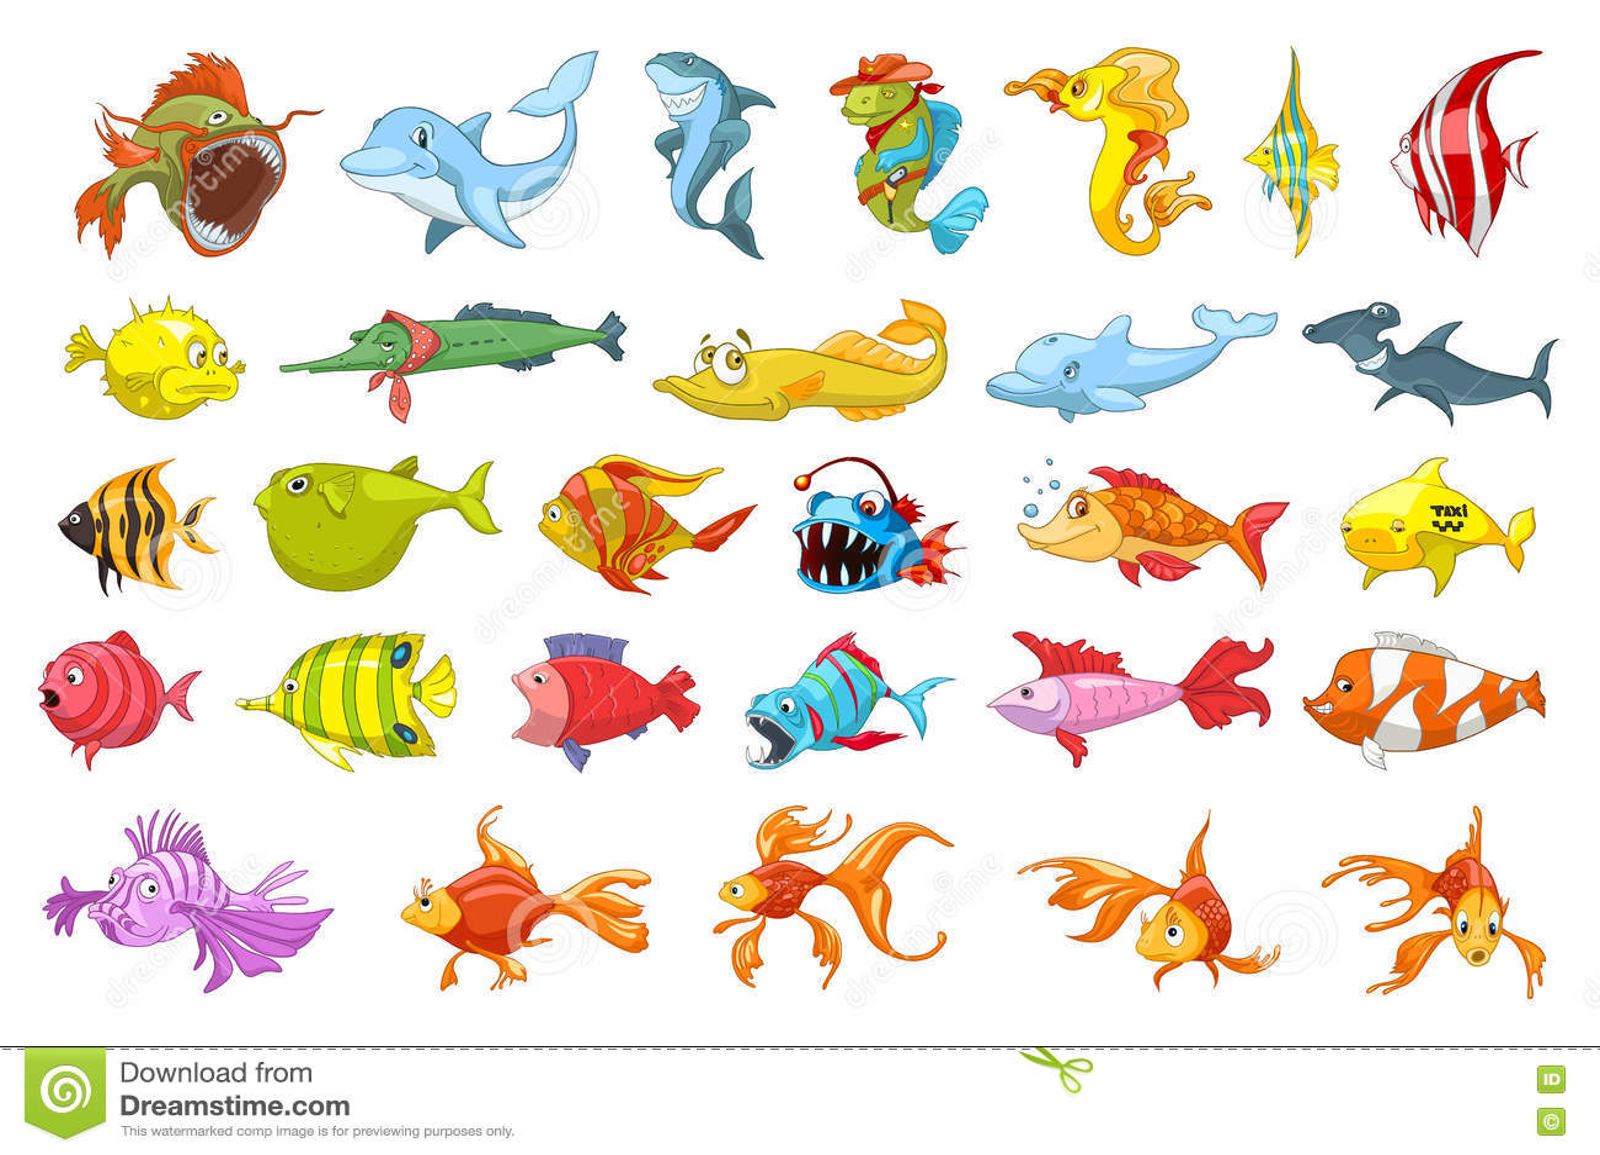 Vector set of fish illustrations.